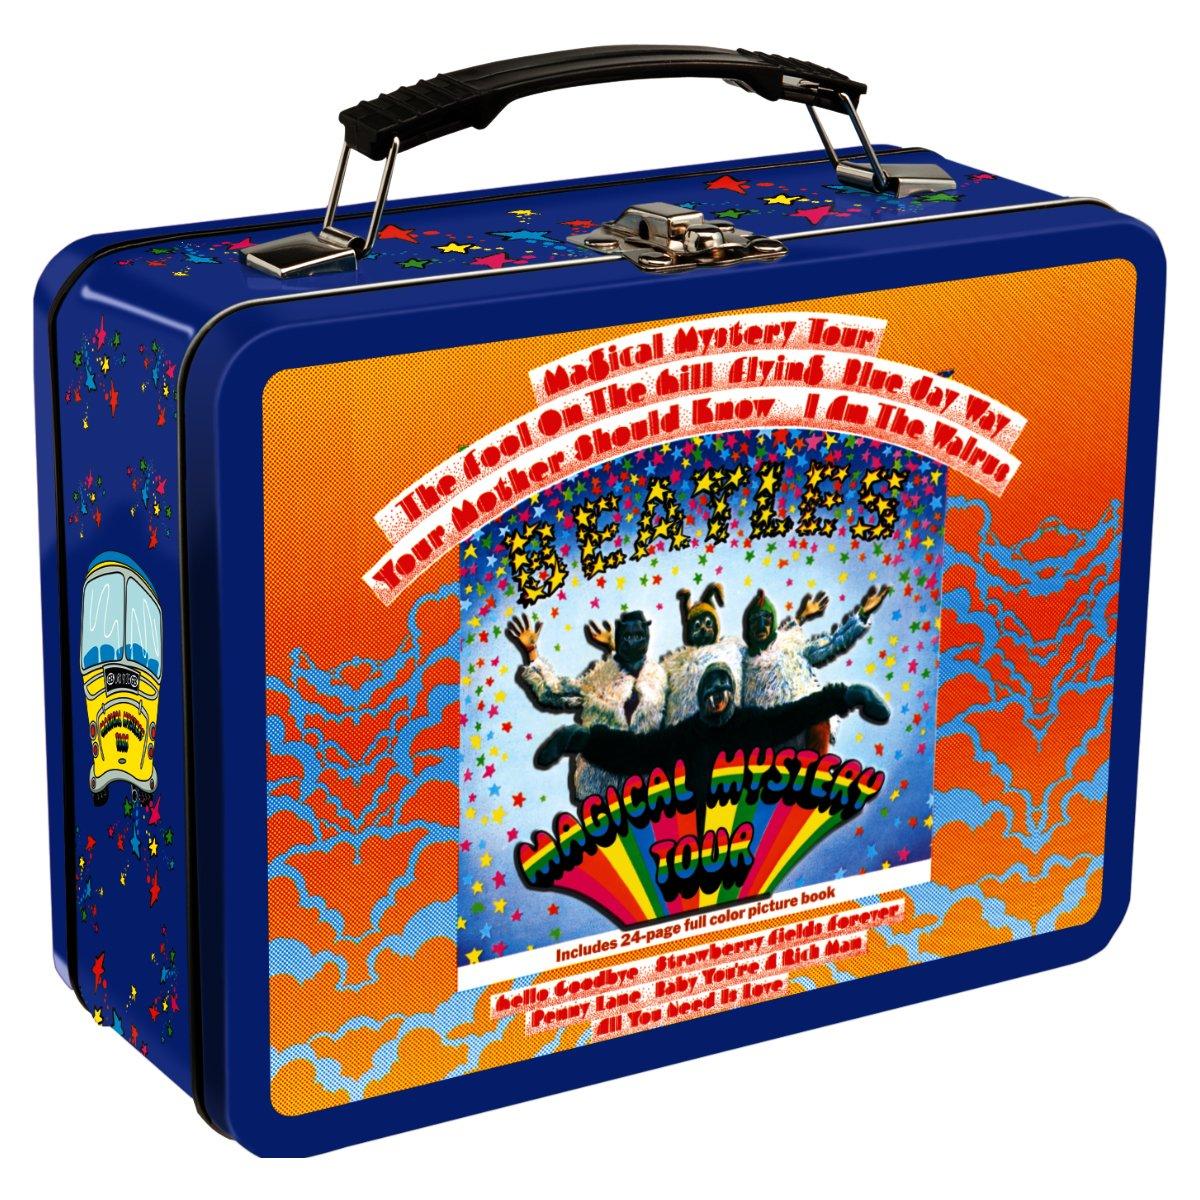 Magical Mystery Tour Tin Tote